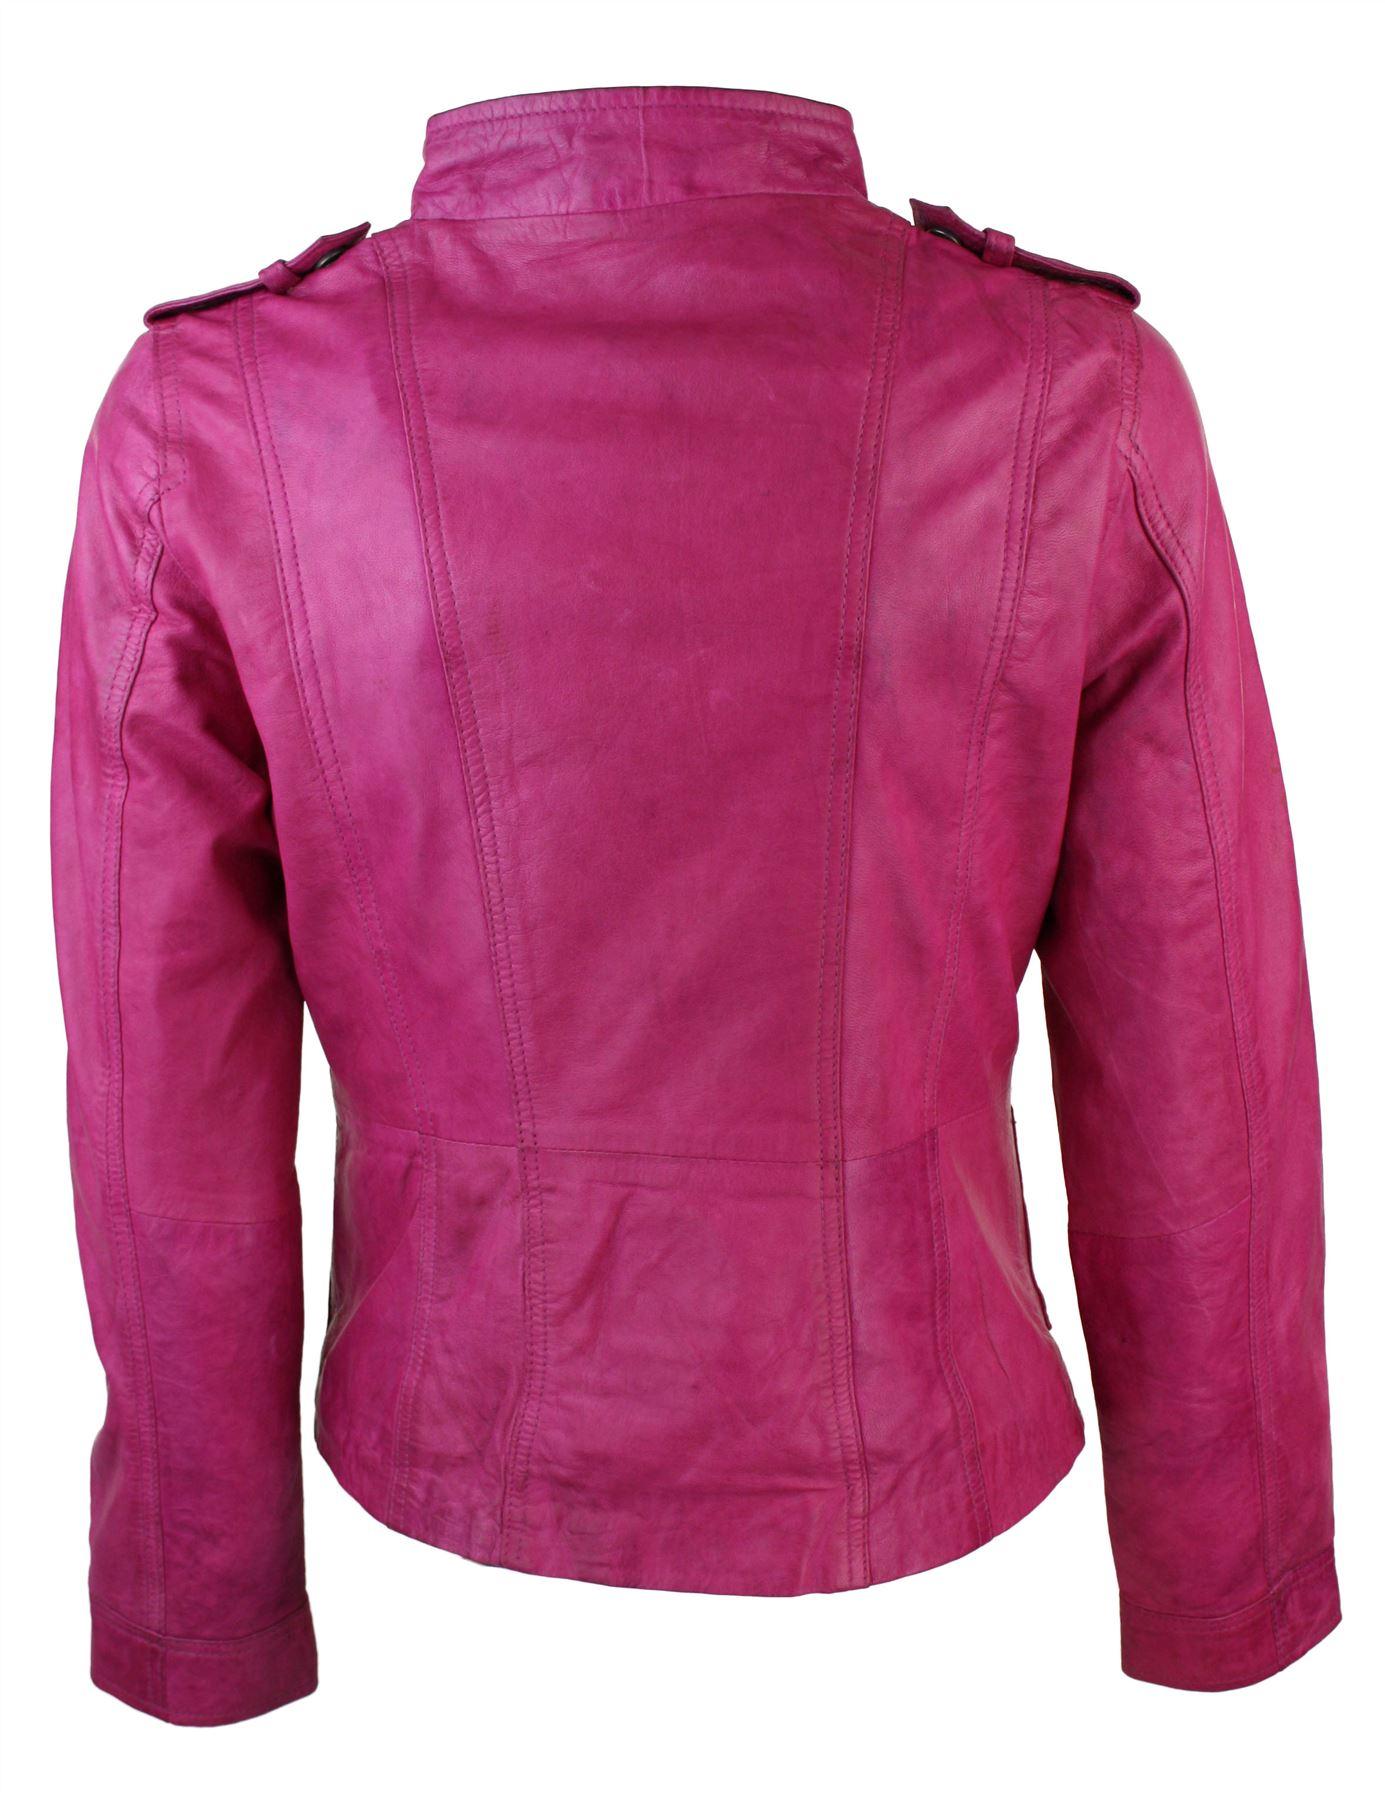 Ladies green leather jacket